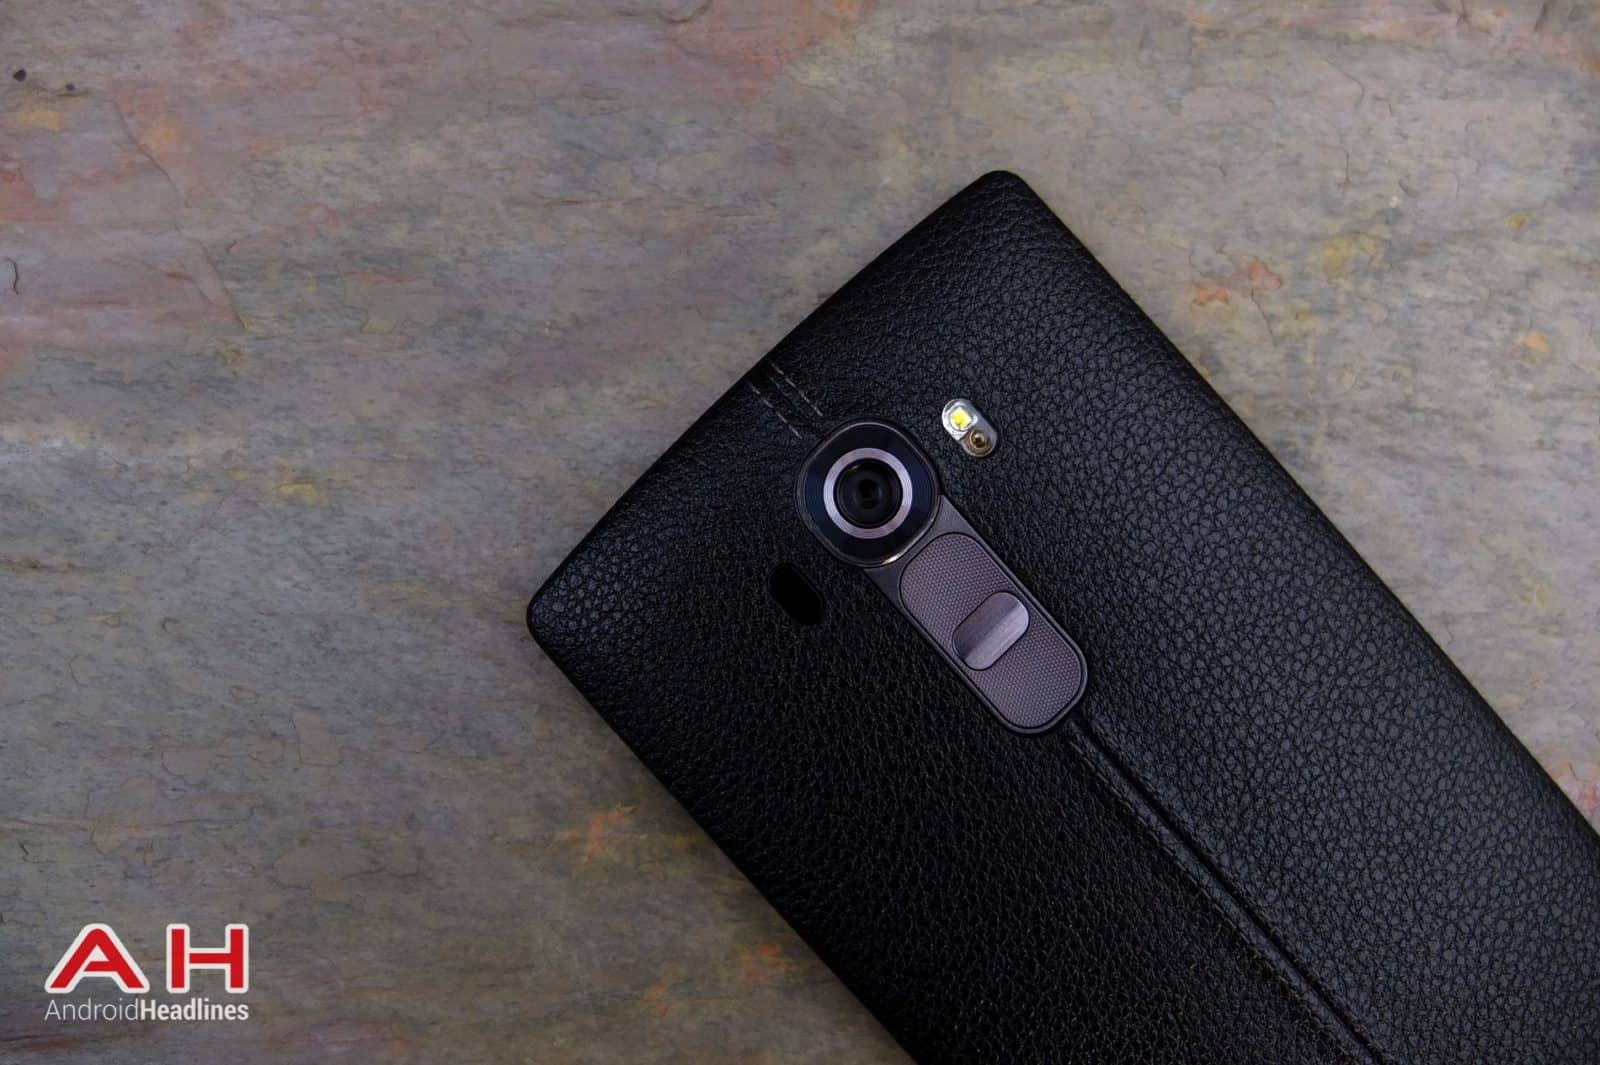 LG G4 BlackLeather TD AH 11